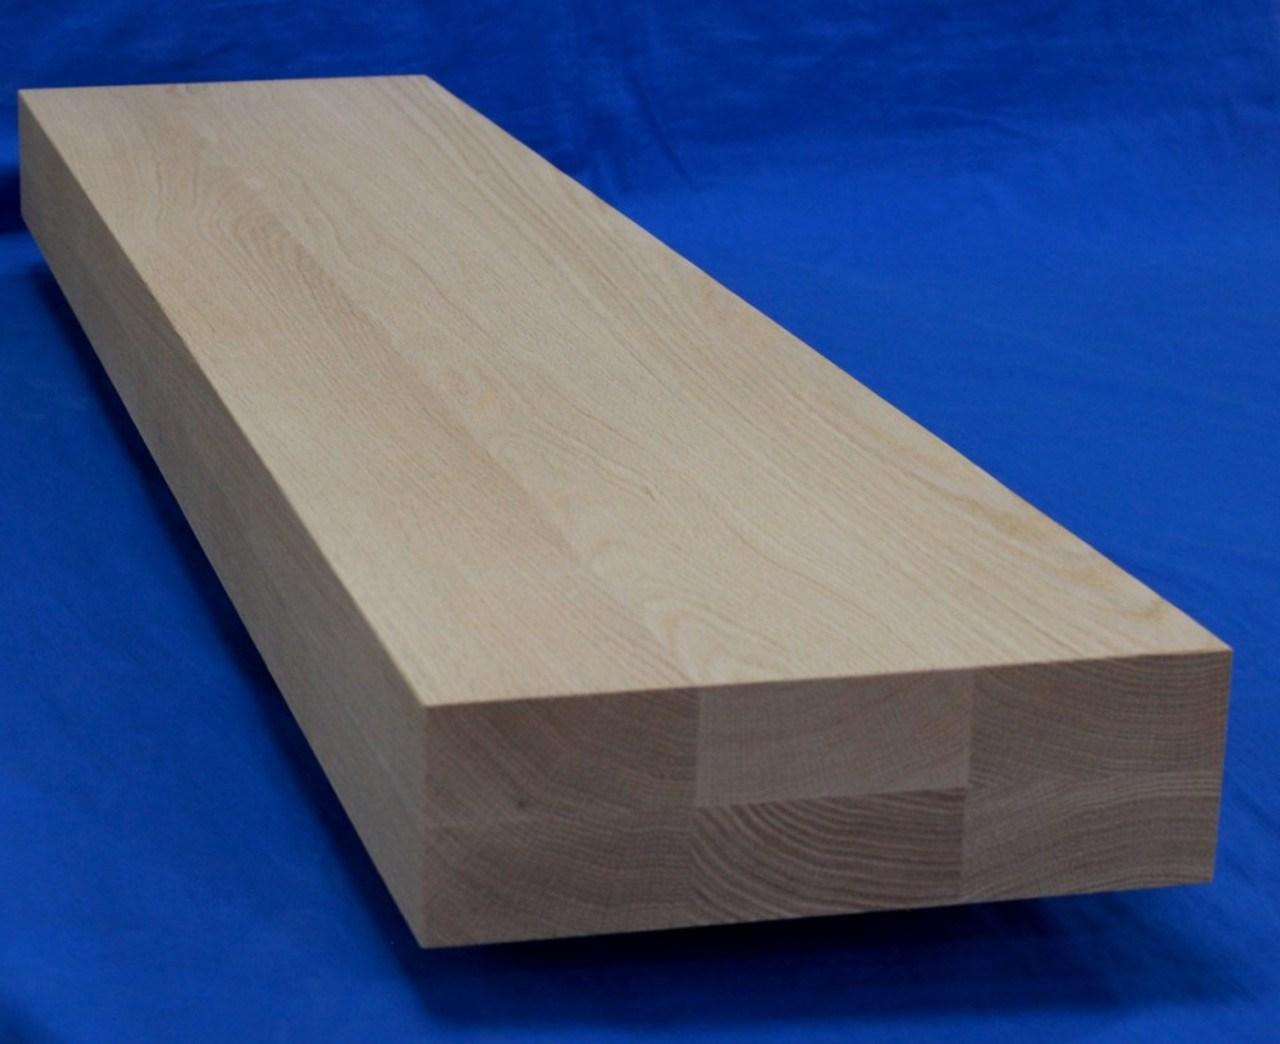 3 1 2 Thick Stair Treads Hardwood Kinzel Wood Products | 48 Inch Red Oak Stair Treads | Wood Stair | Stair Nosing | Solid Oak | Stair Riser Kit | Bull Nose